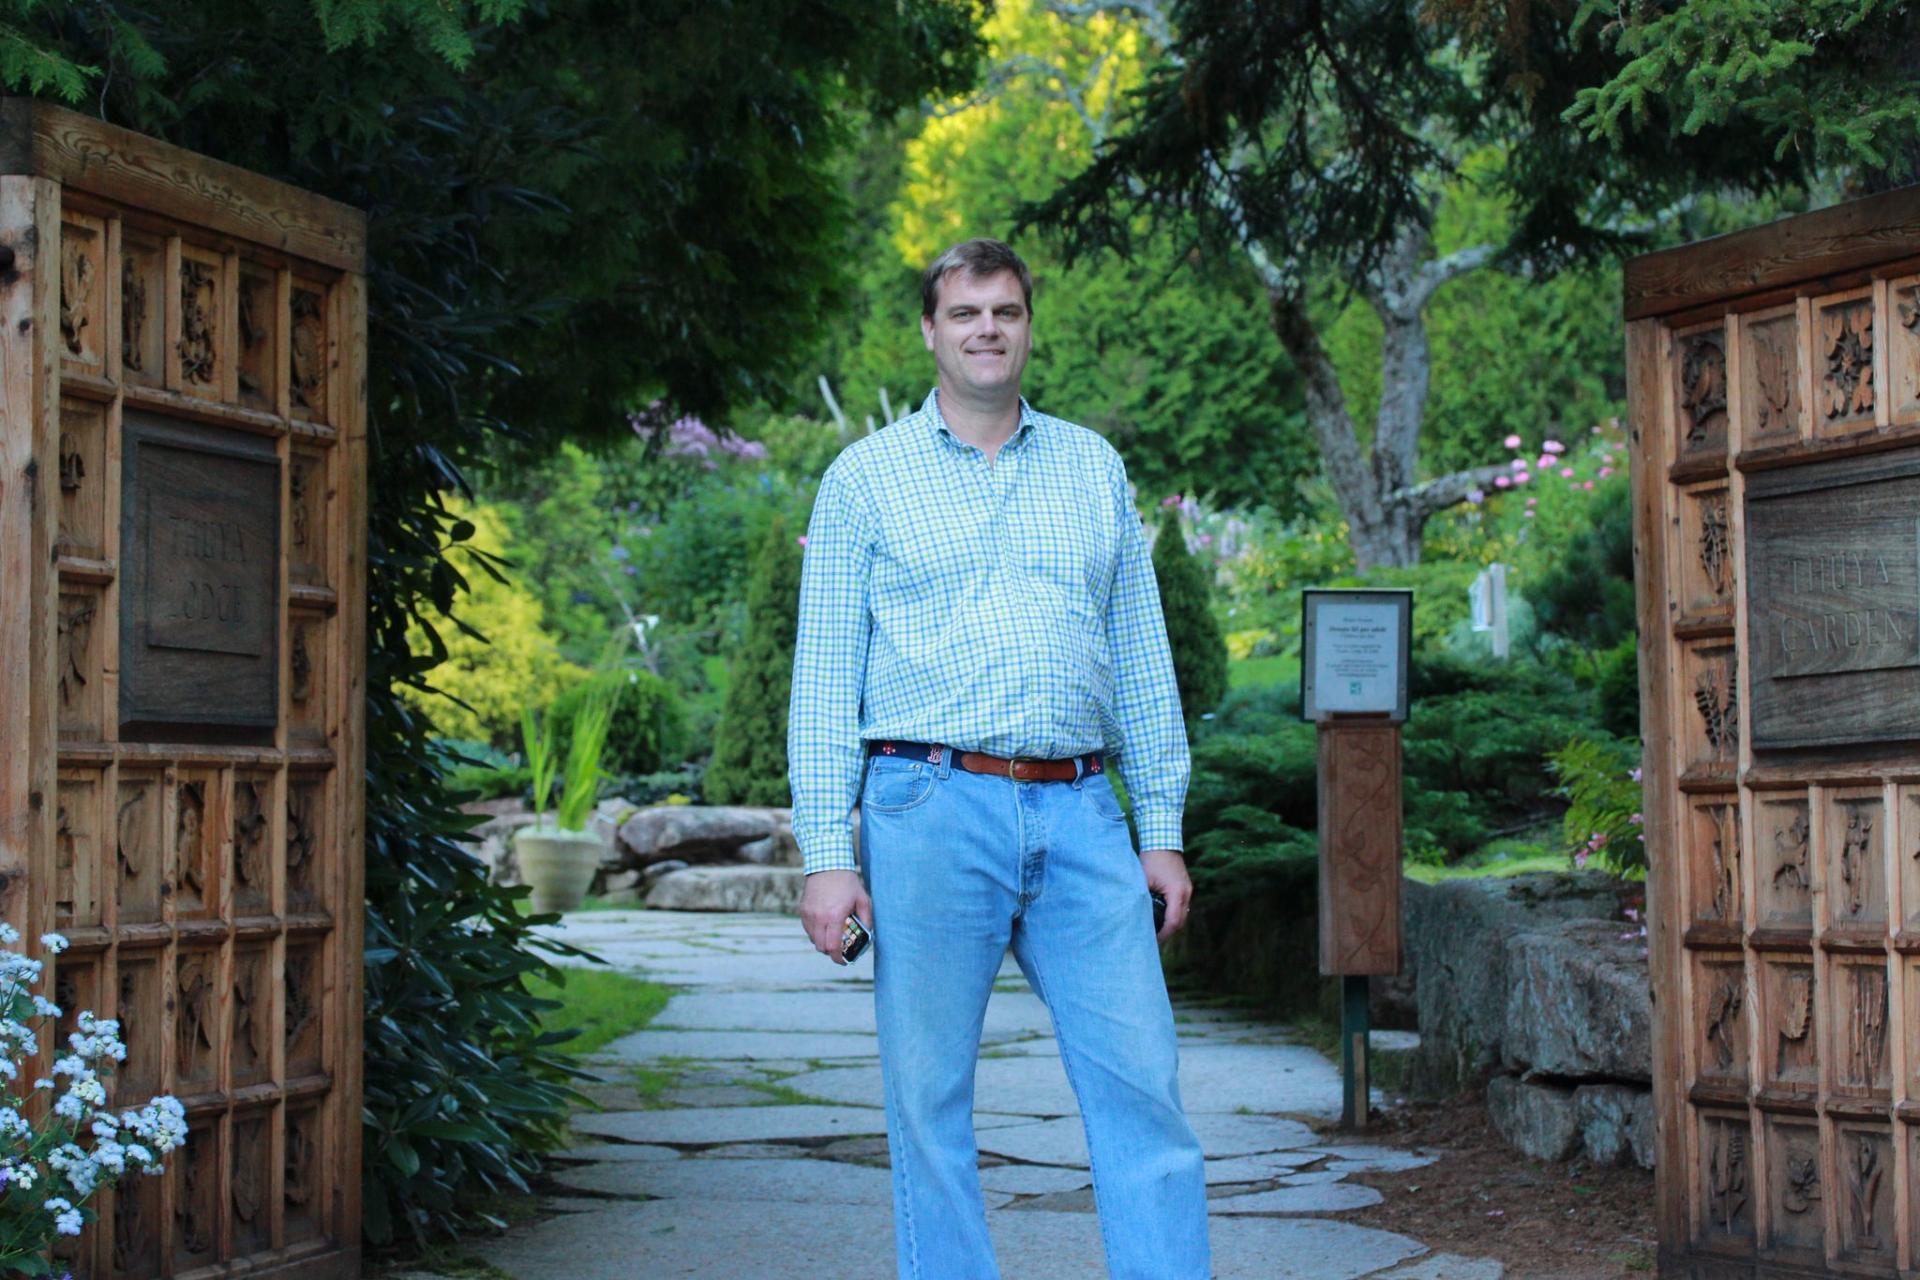 Land Garden Preserve Elects New Board Chair American Public Gardens Association